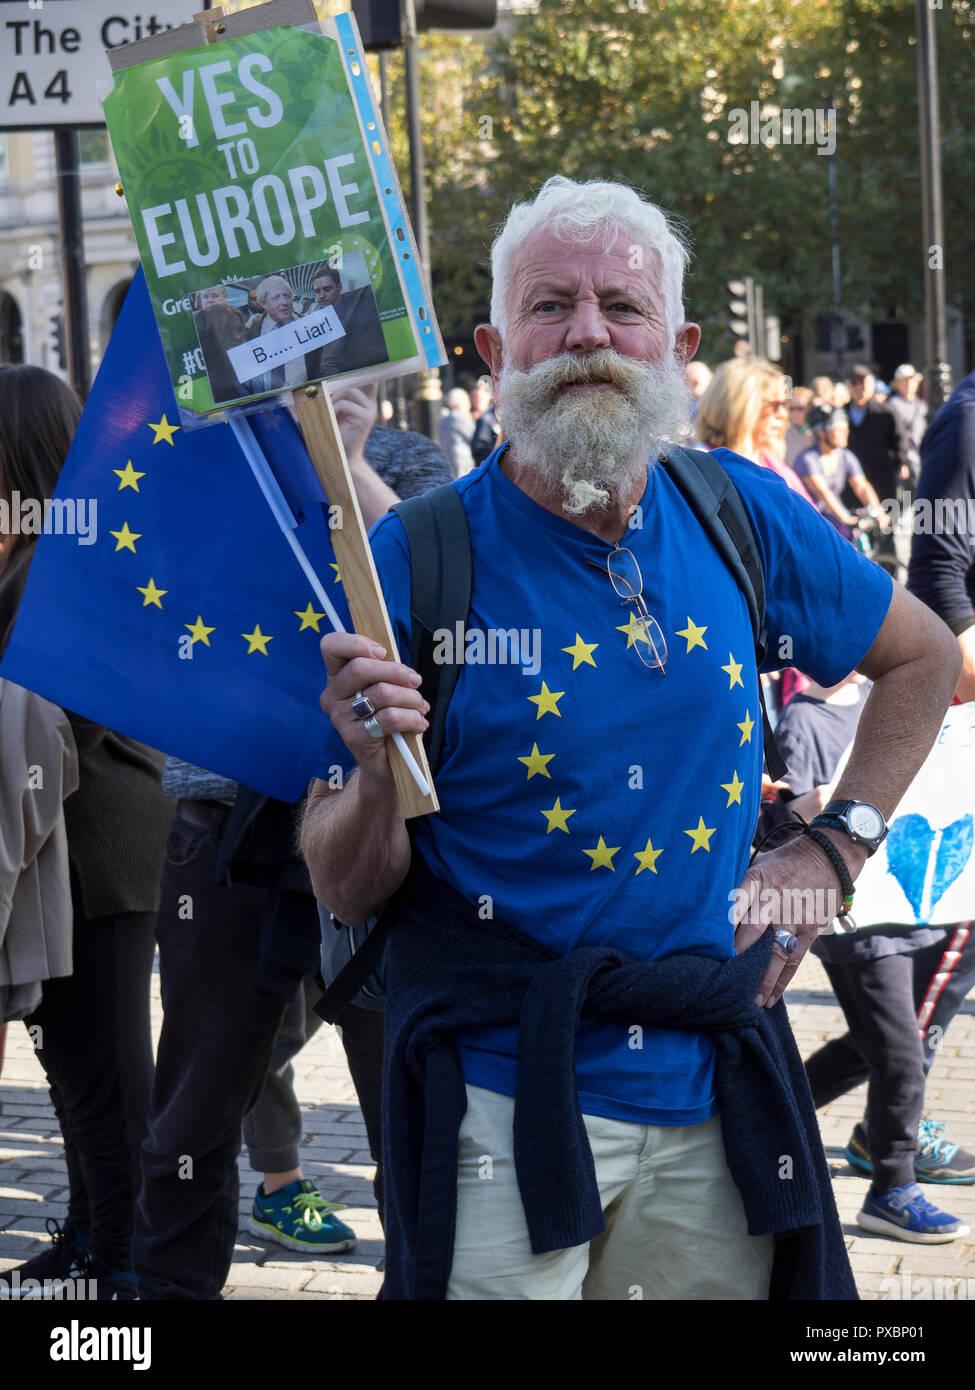 Pro-European protestor against Brexit - Stock Image